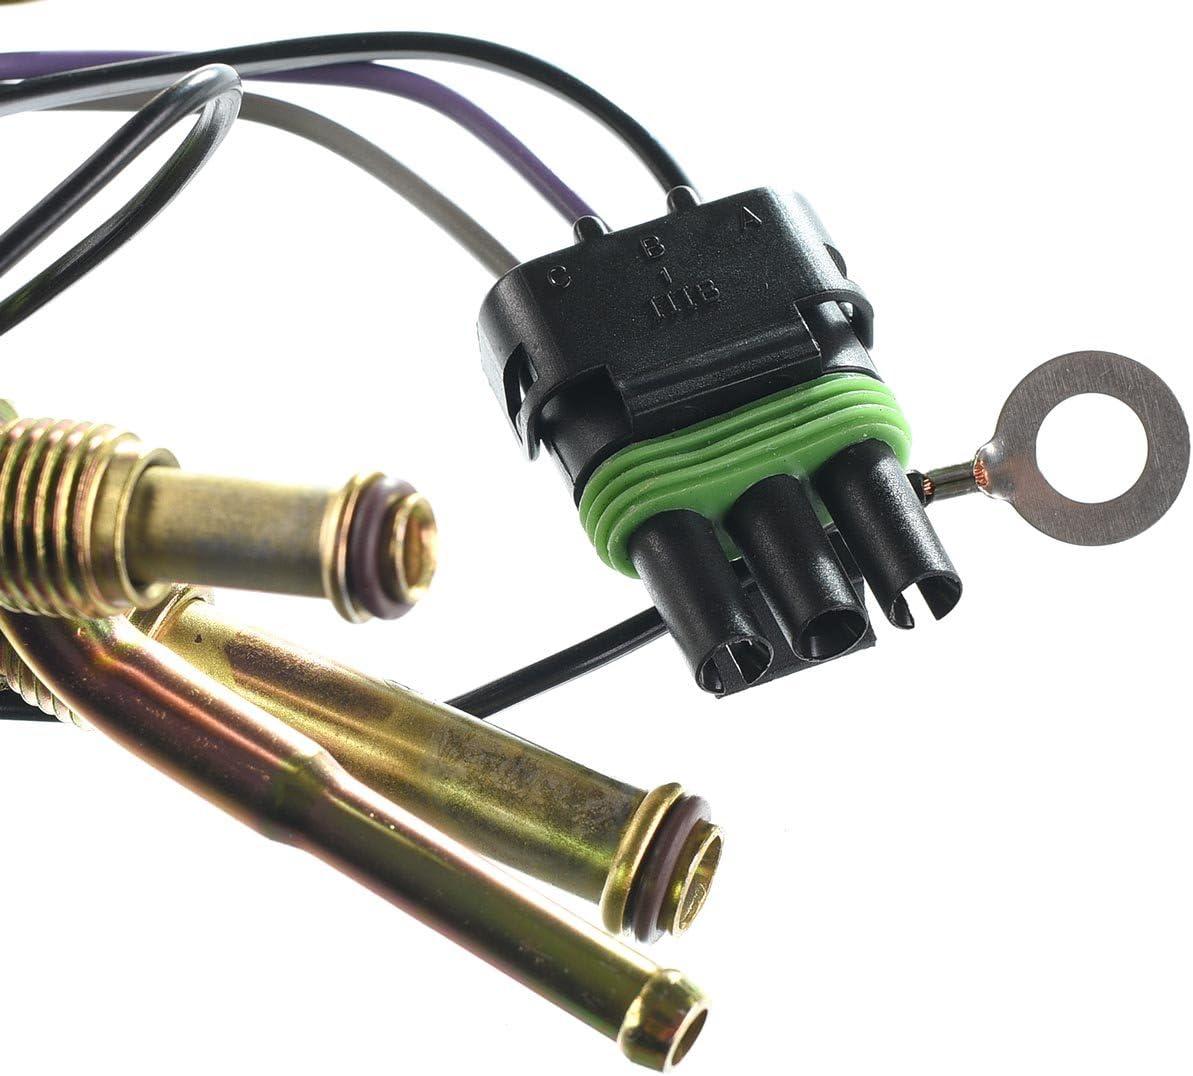 Electric Fuel Pump Assembly for Chevrolet GMC C1500 C2500 C3500 K1500 K2500 K3500 1988-1995